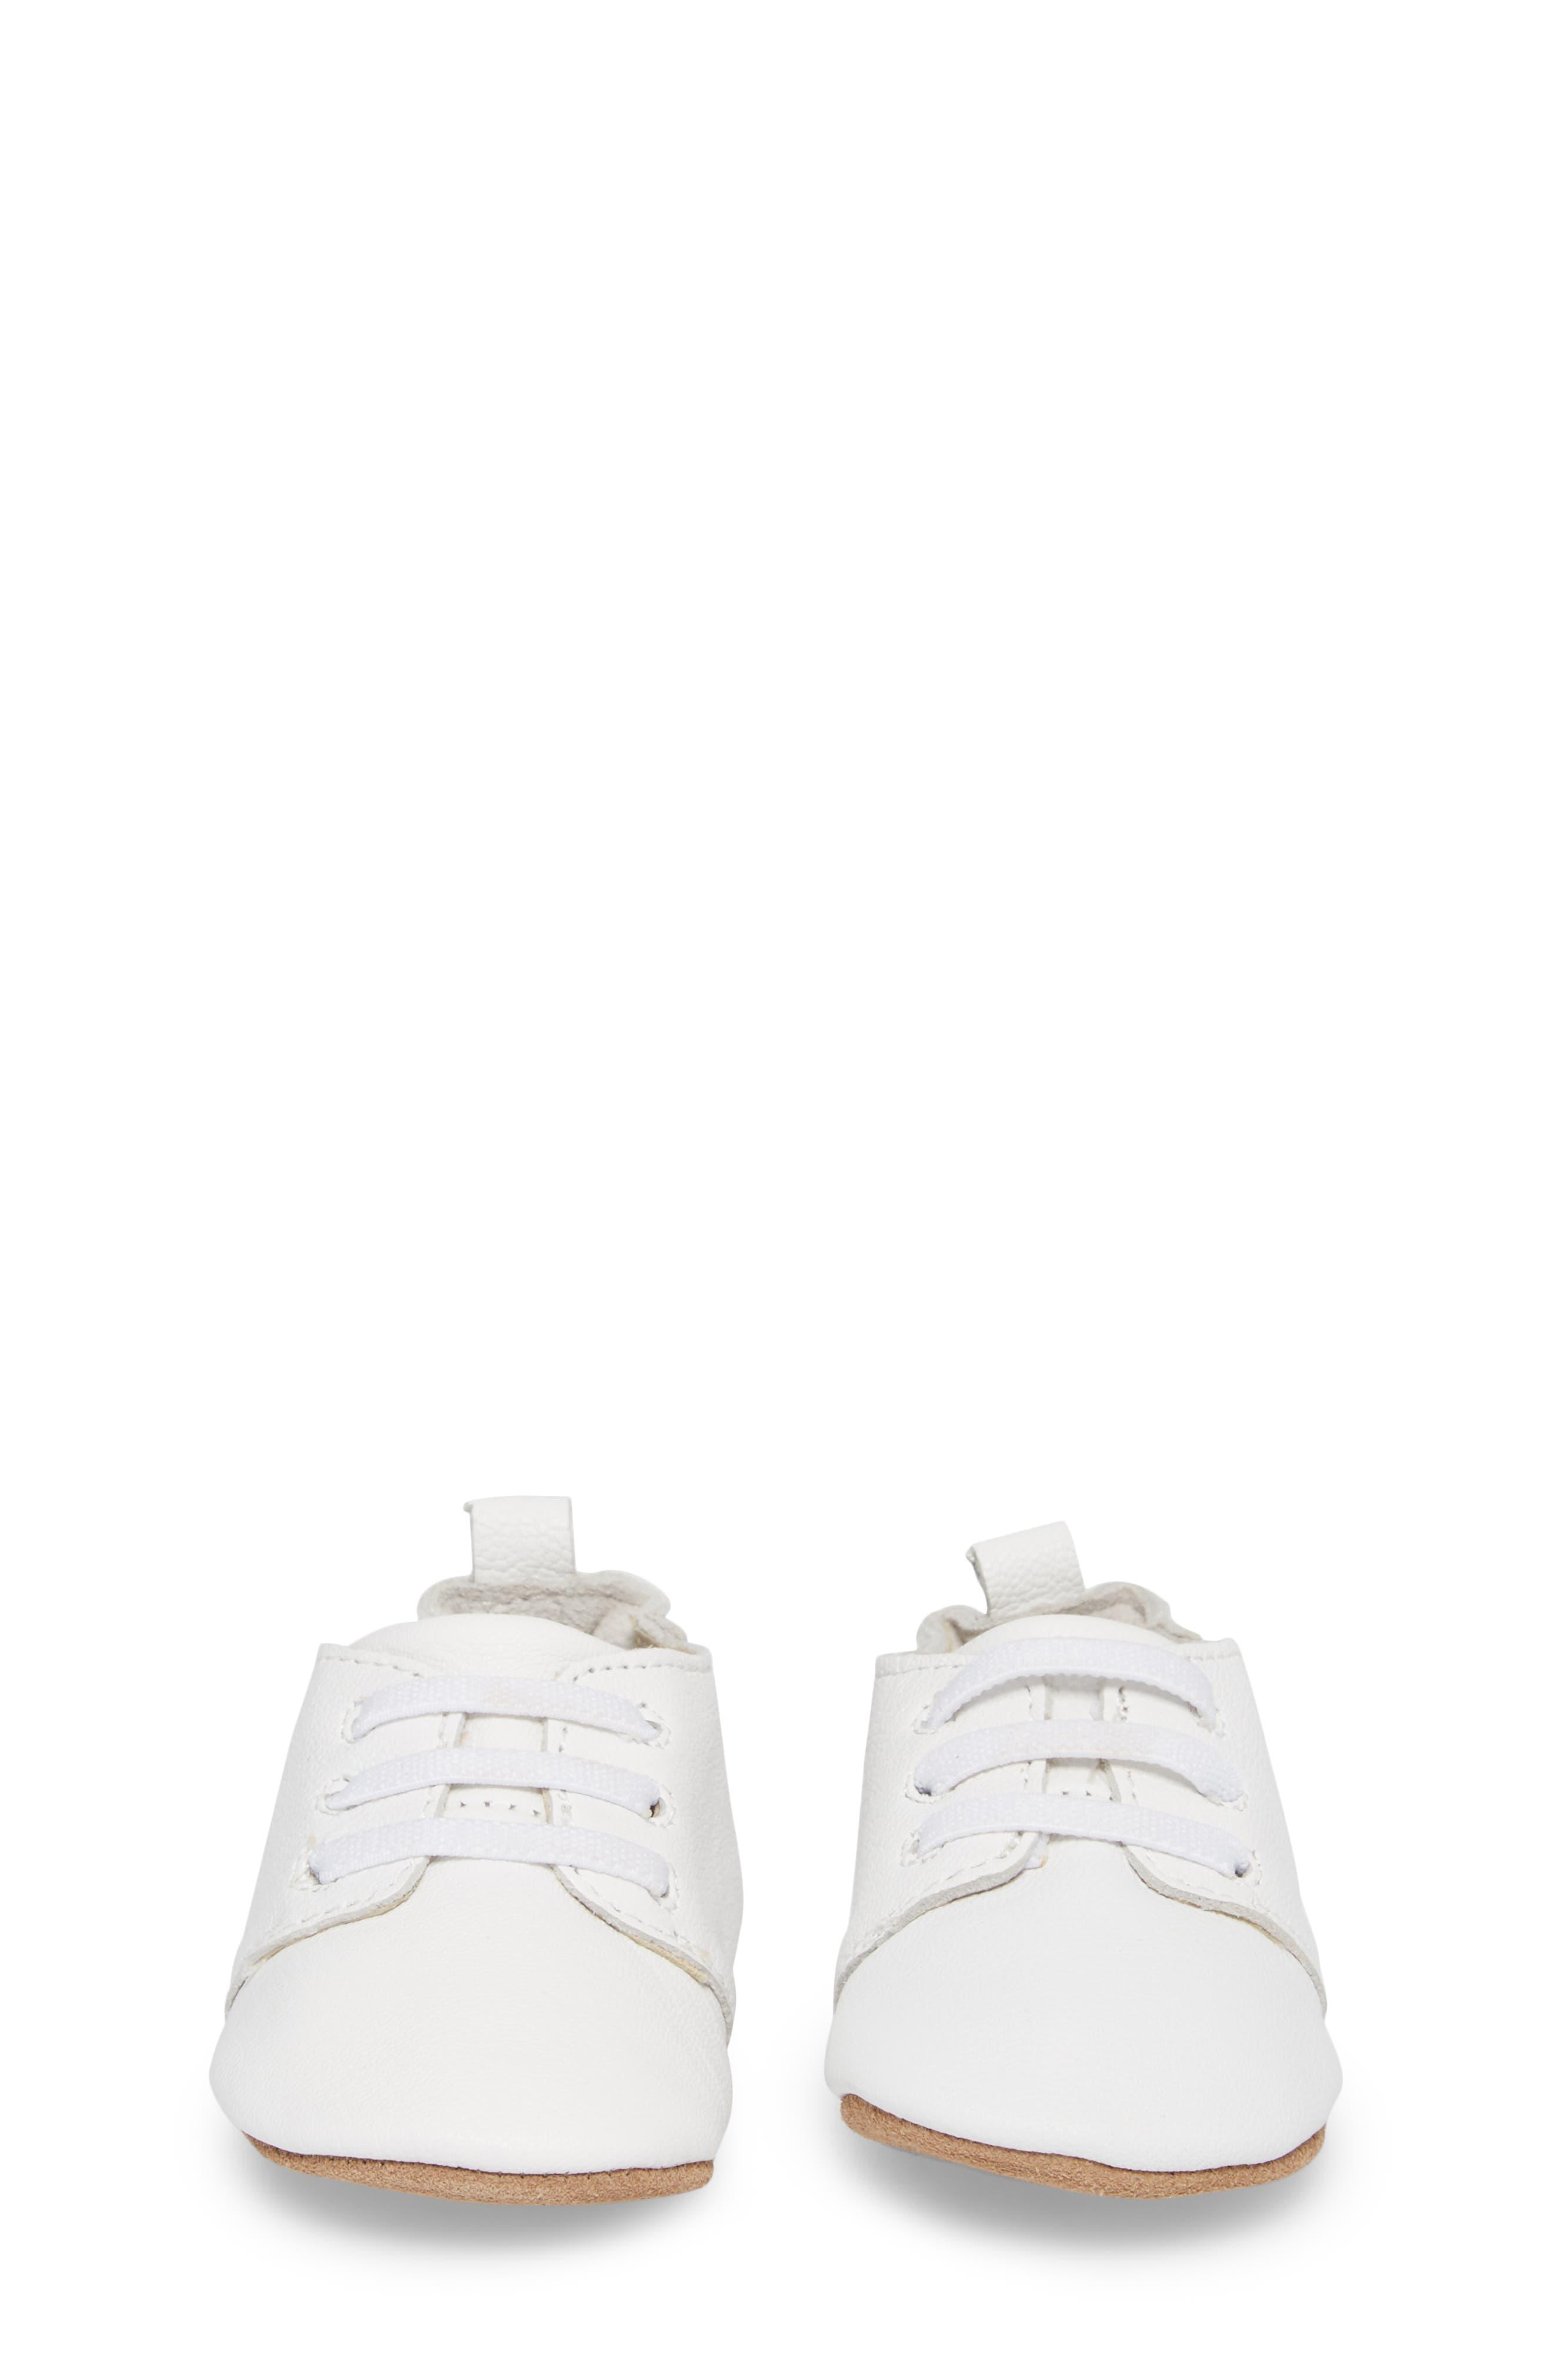 ROBEEZ<SUP>®</SUP>, Owen Oxford Crib Shoe, Alternate thumbnail 4, color, WHITE